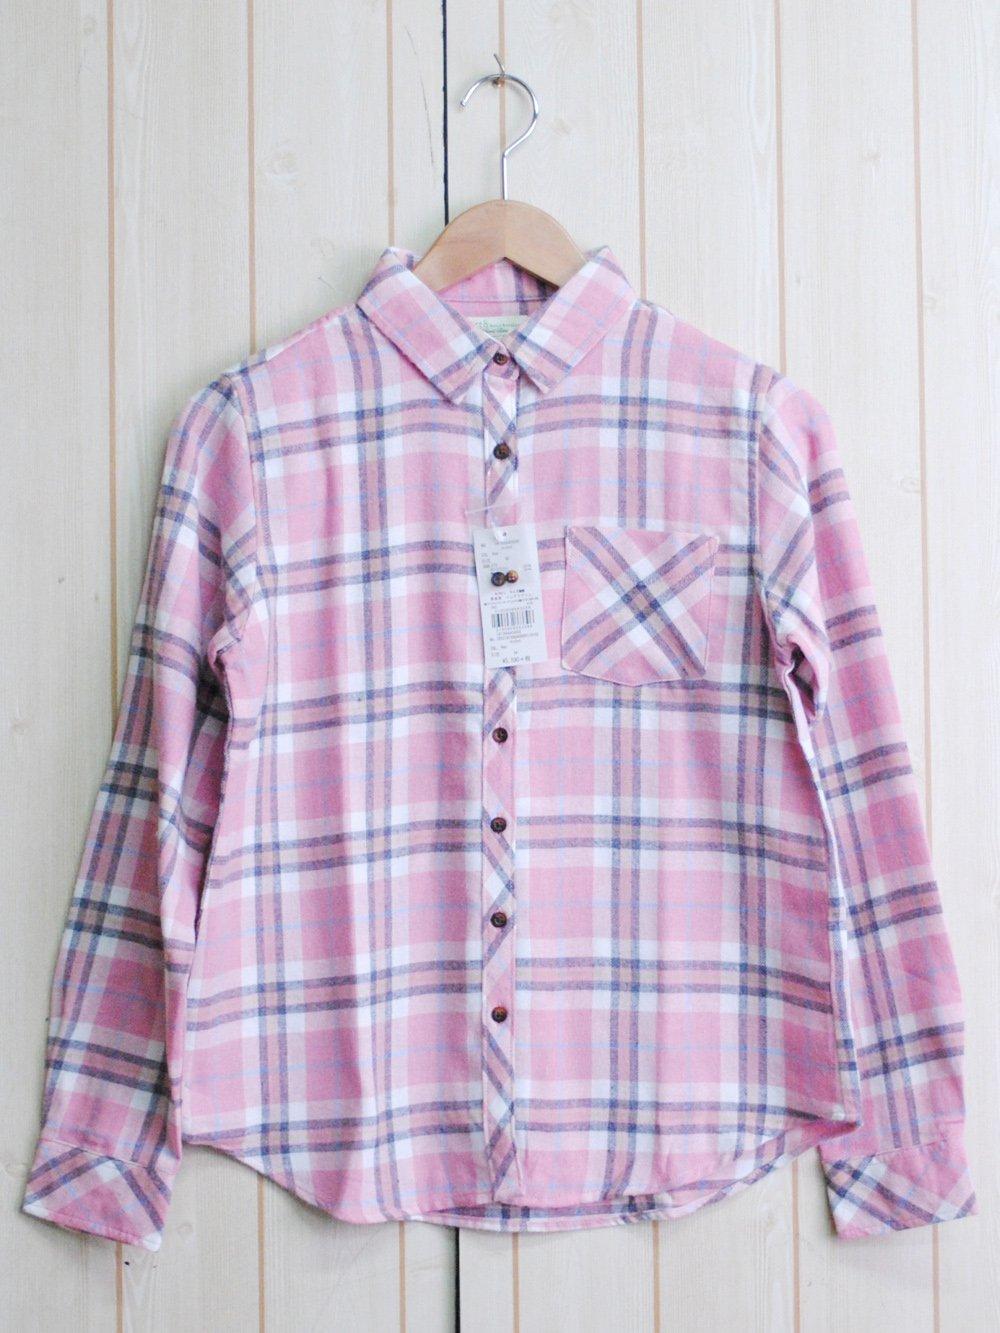 【92%OFF】@450円■5枚セット■チェックシャツ